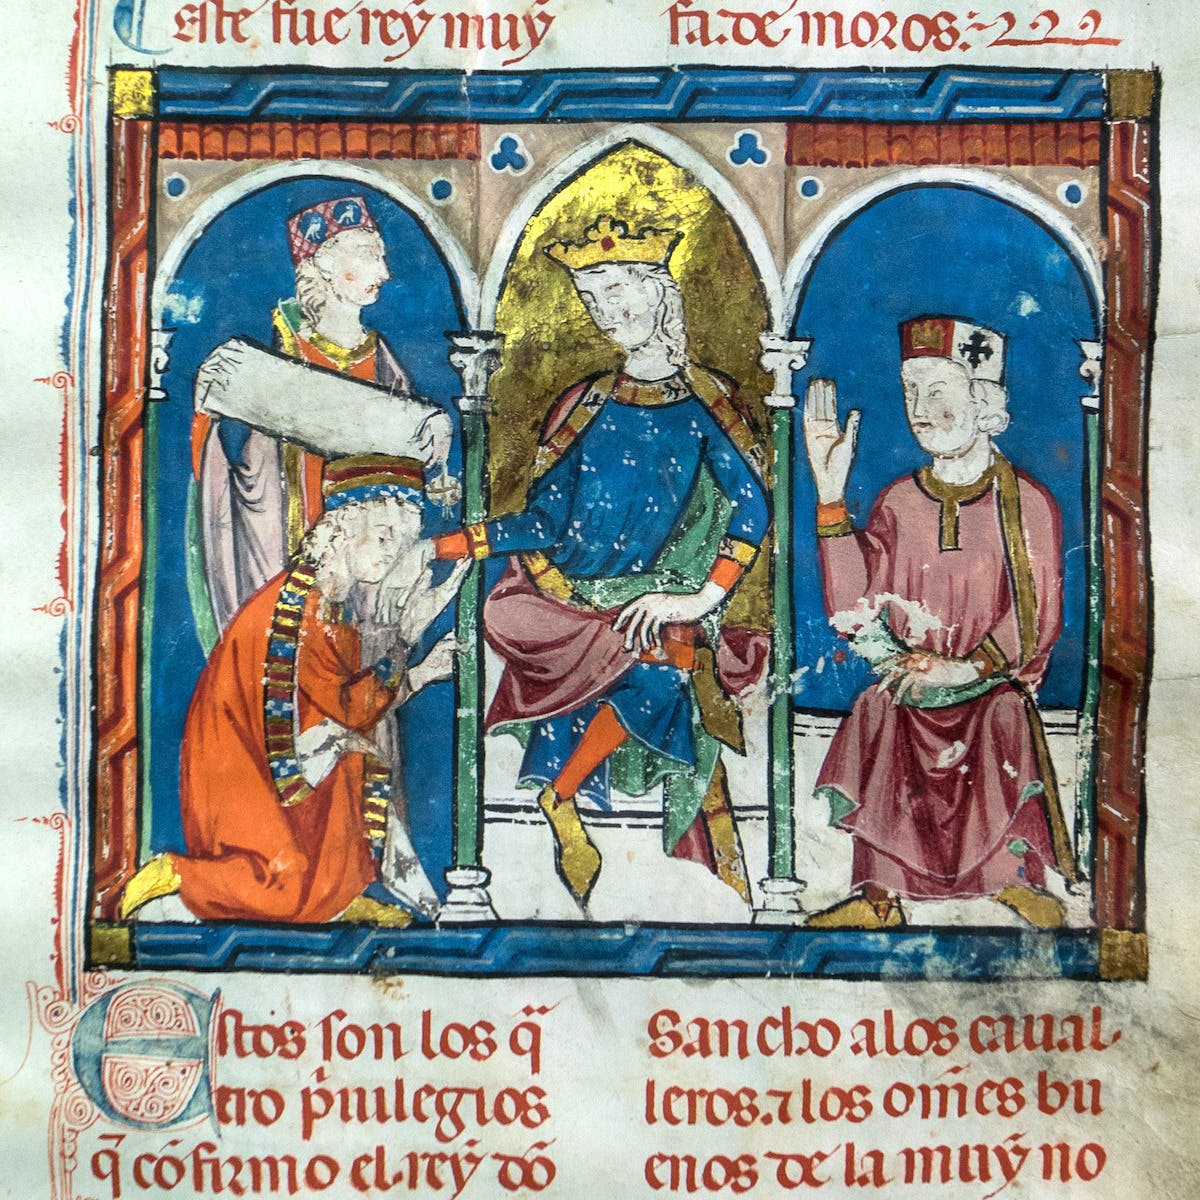 Toledo: Deciphering Secrets of Medieval Spain